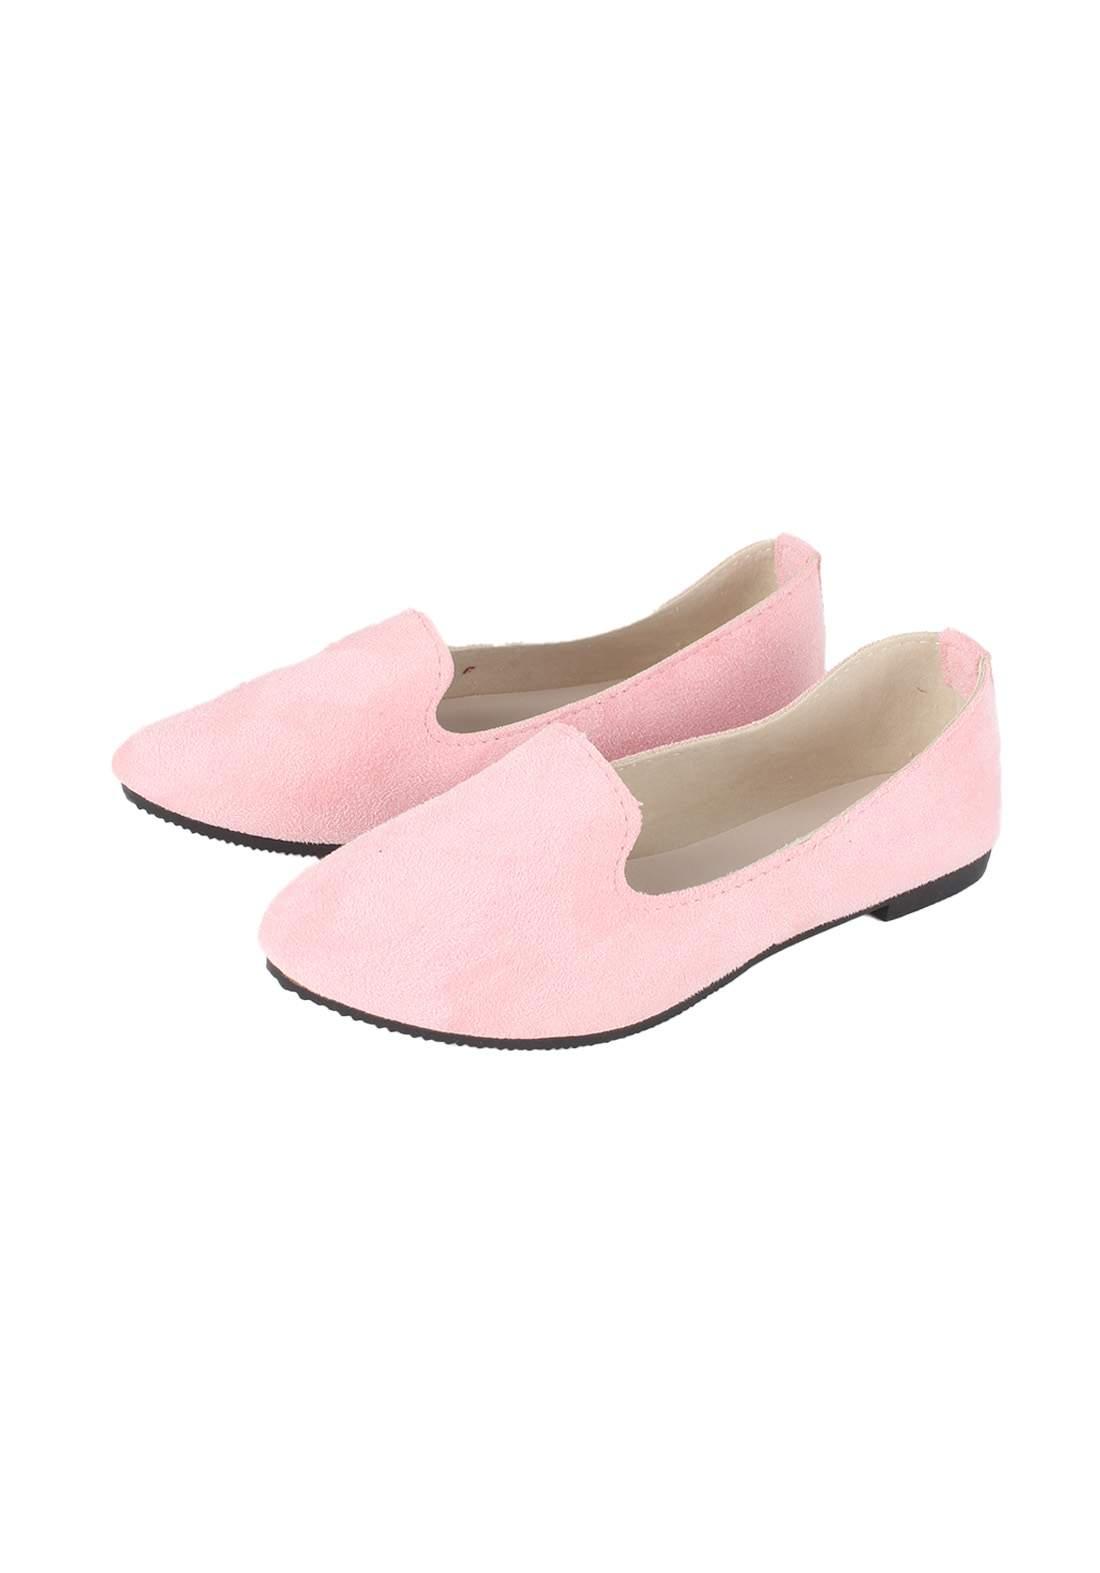 حذاء نسائي فلات وردي اللون